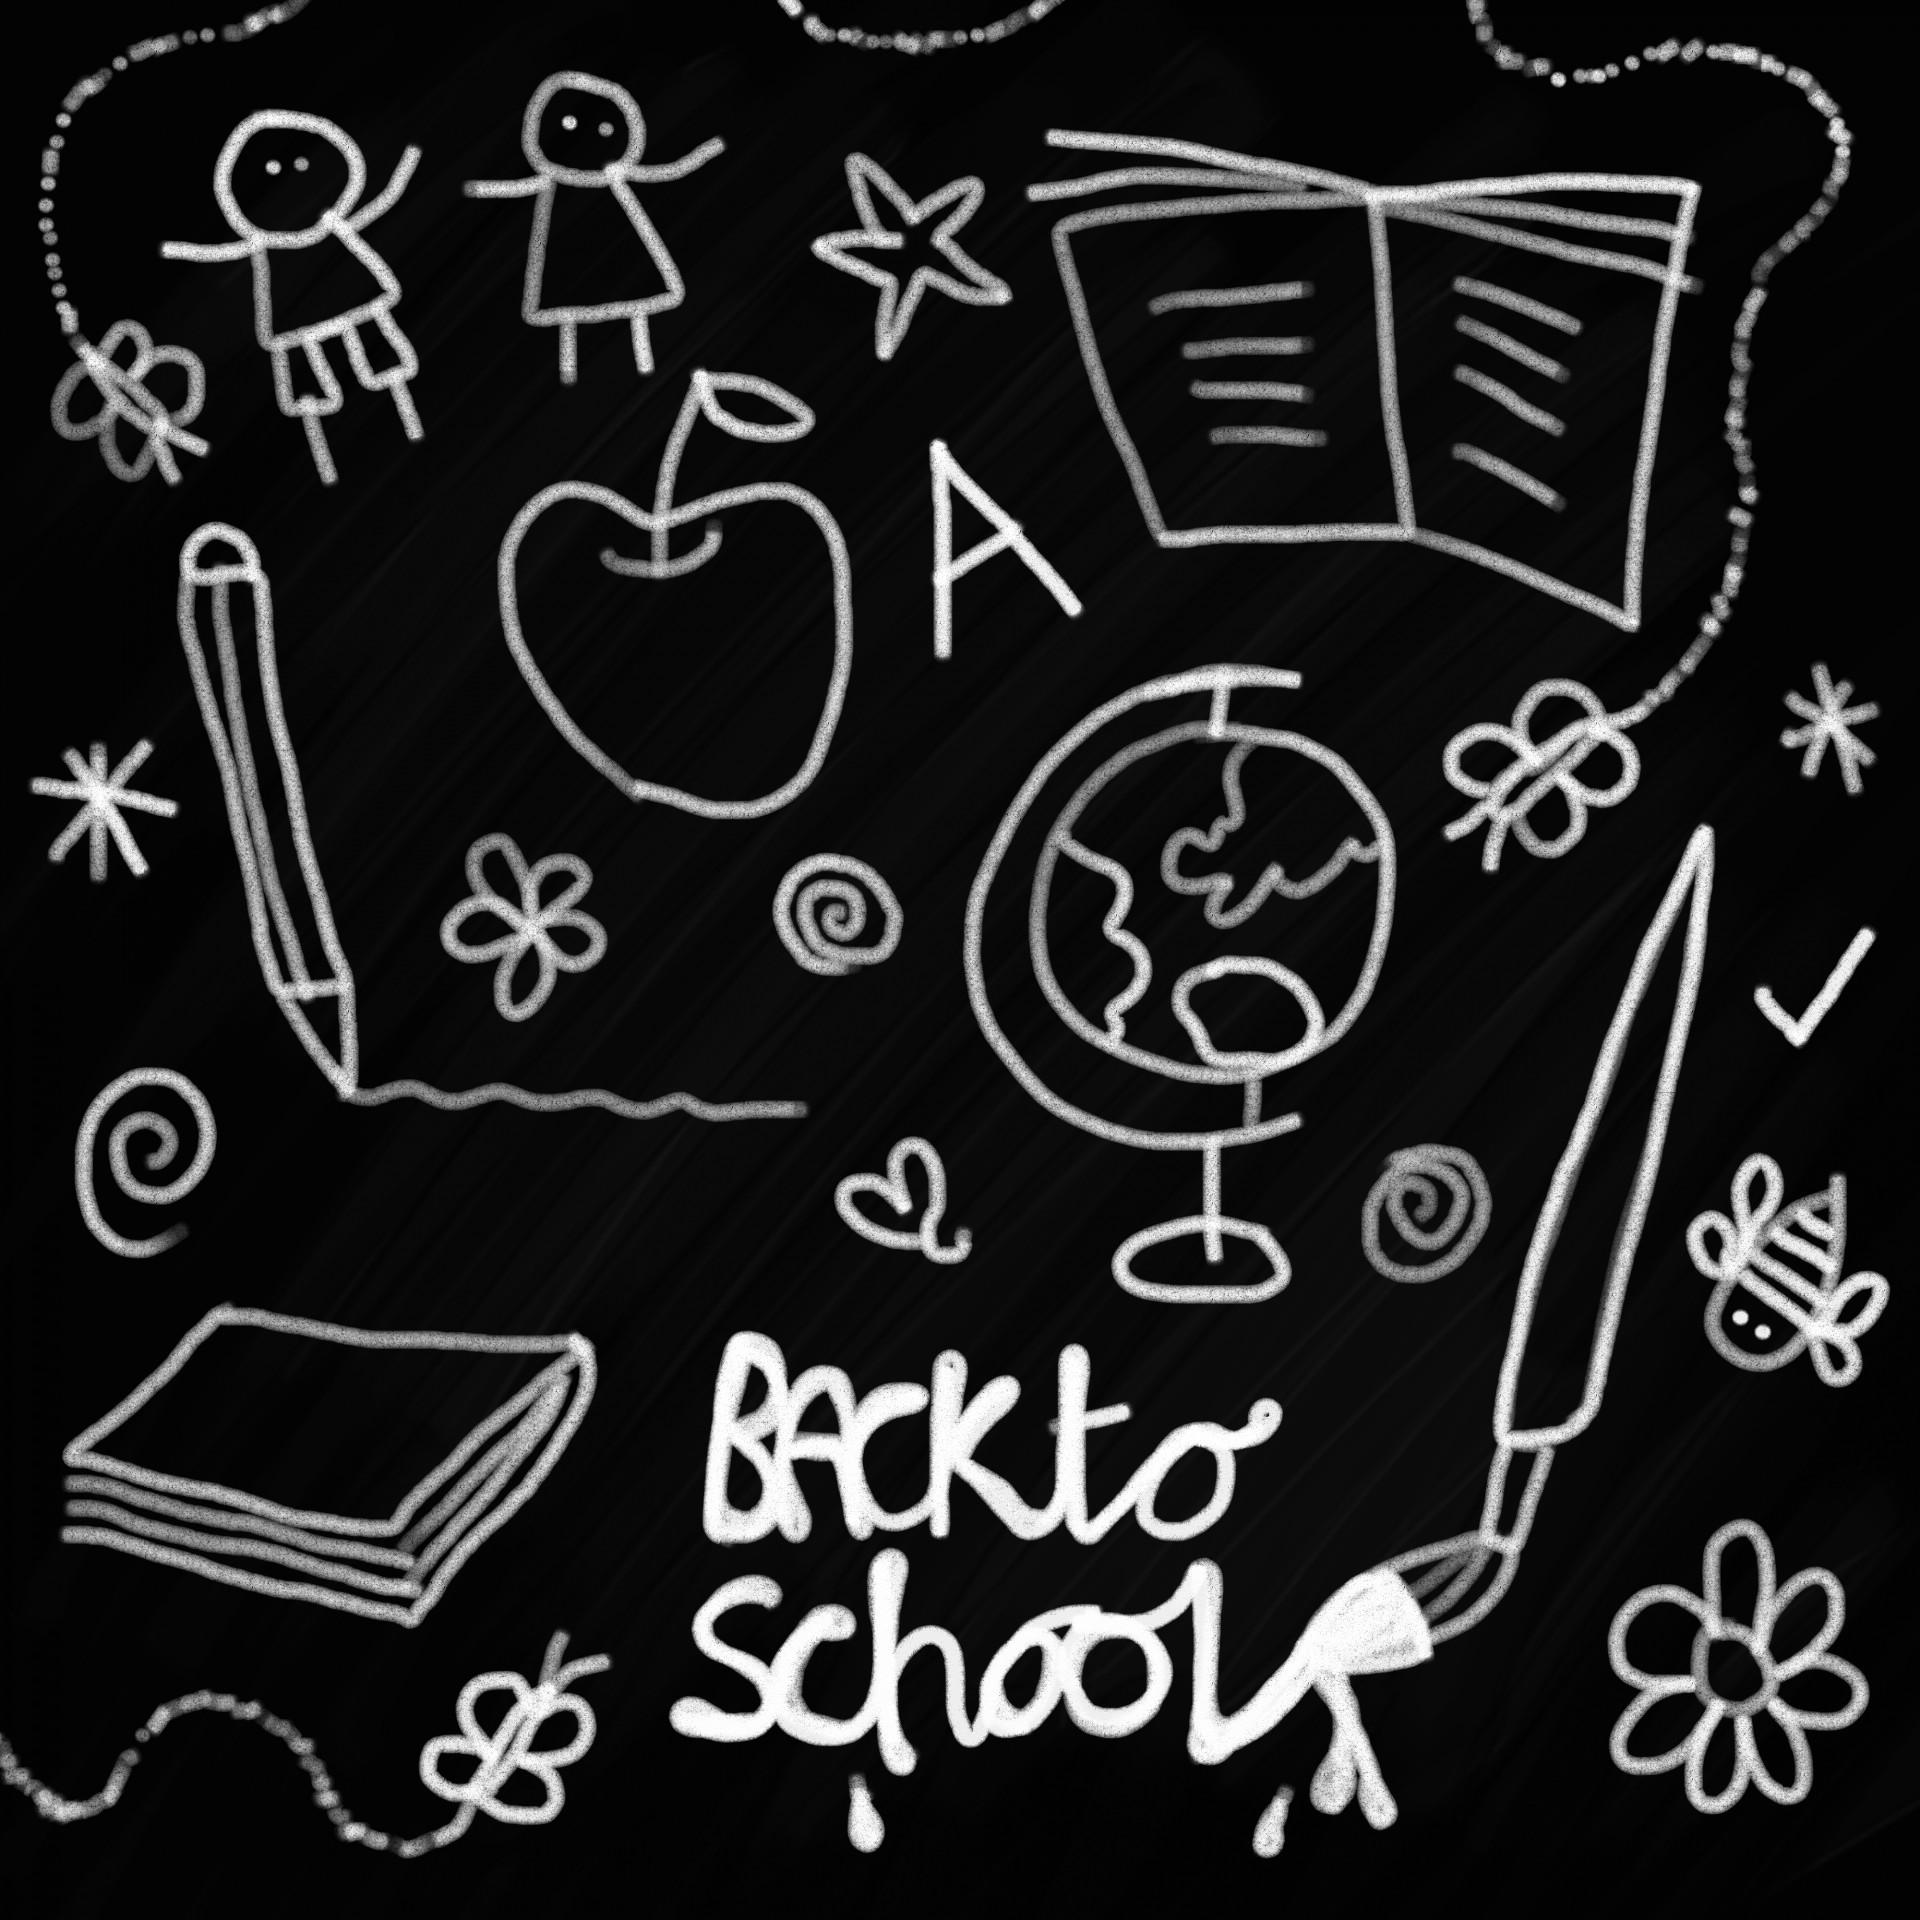 blog back-to-school-clip-art reuse aug16